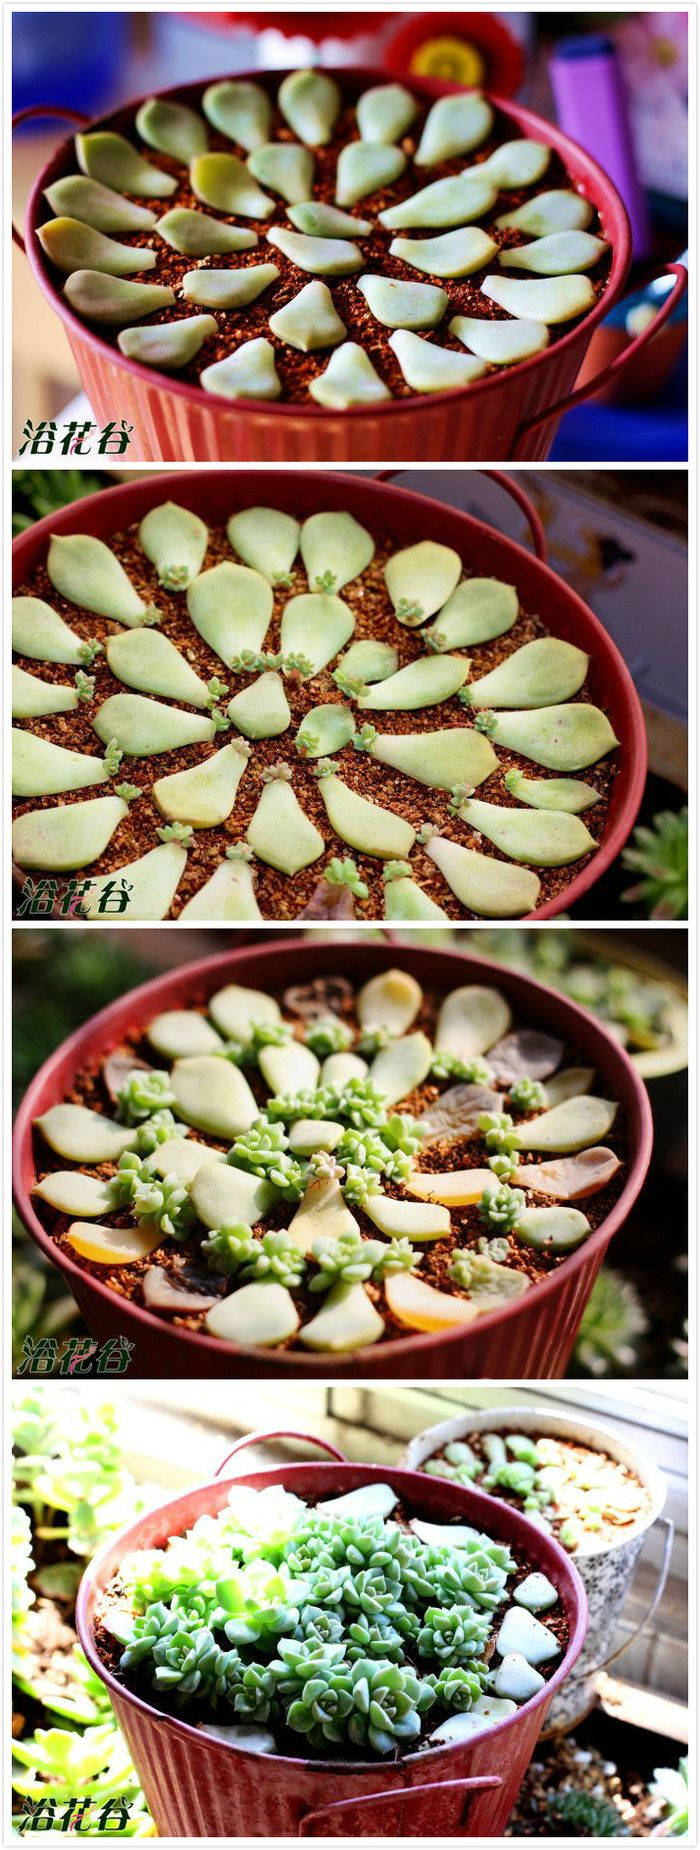 Como cultivar suculentas, ... ou como multiplicá-las.